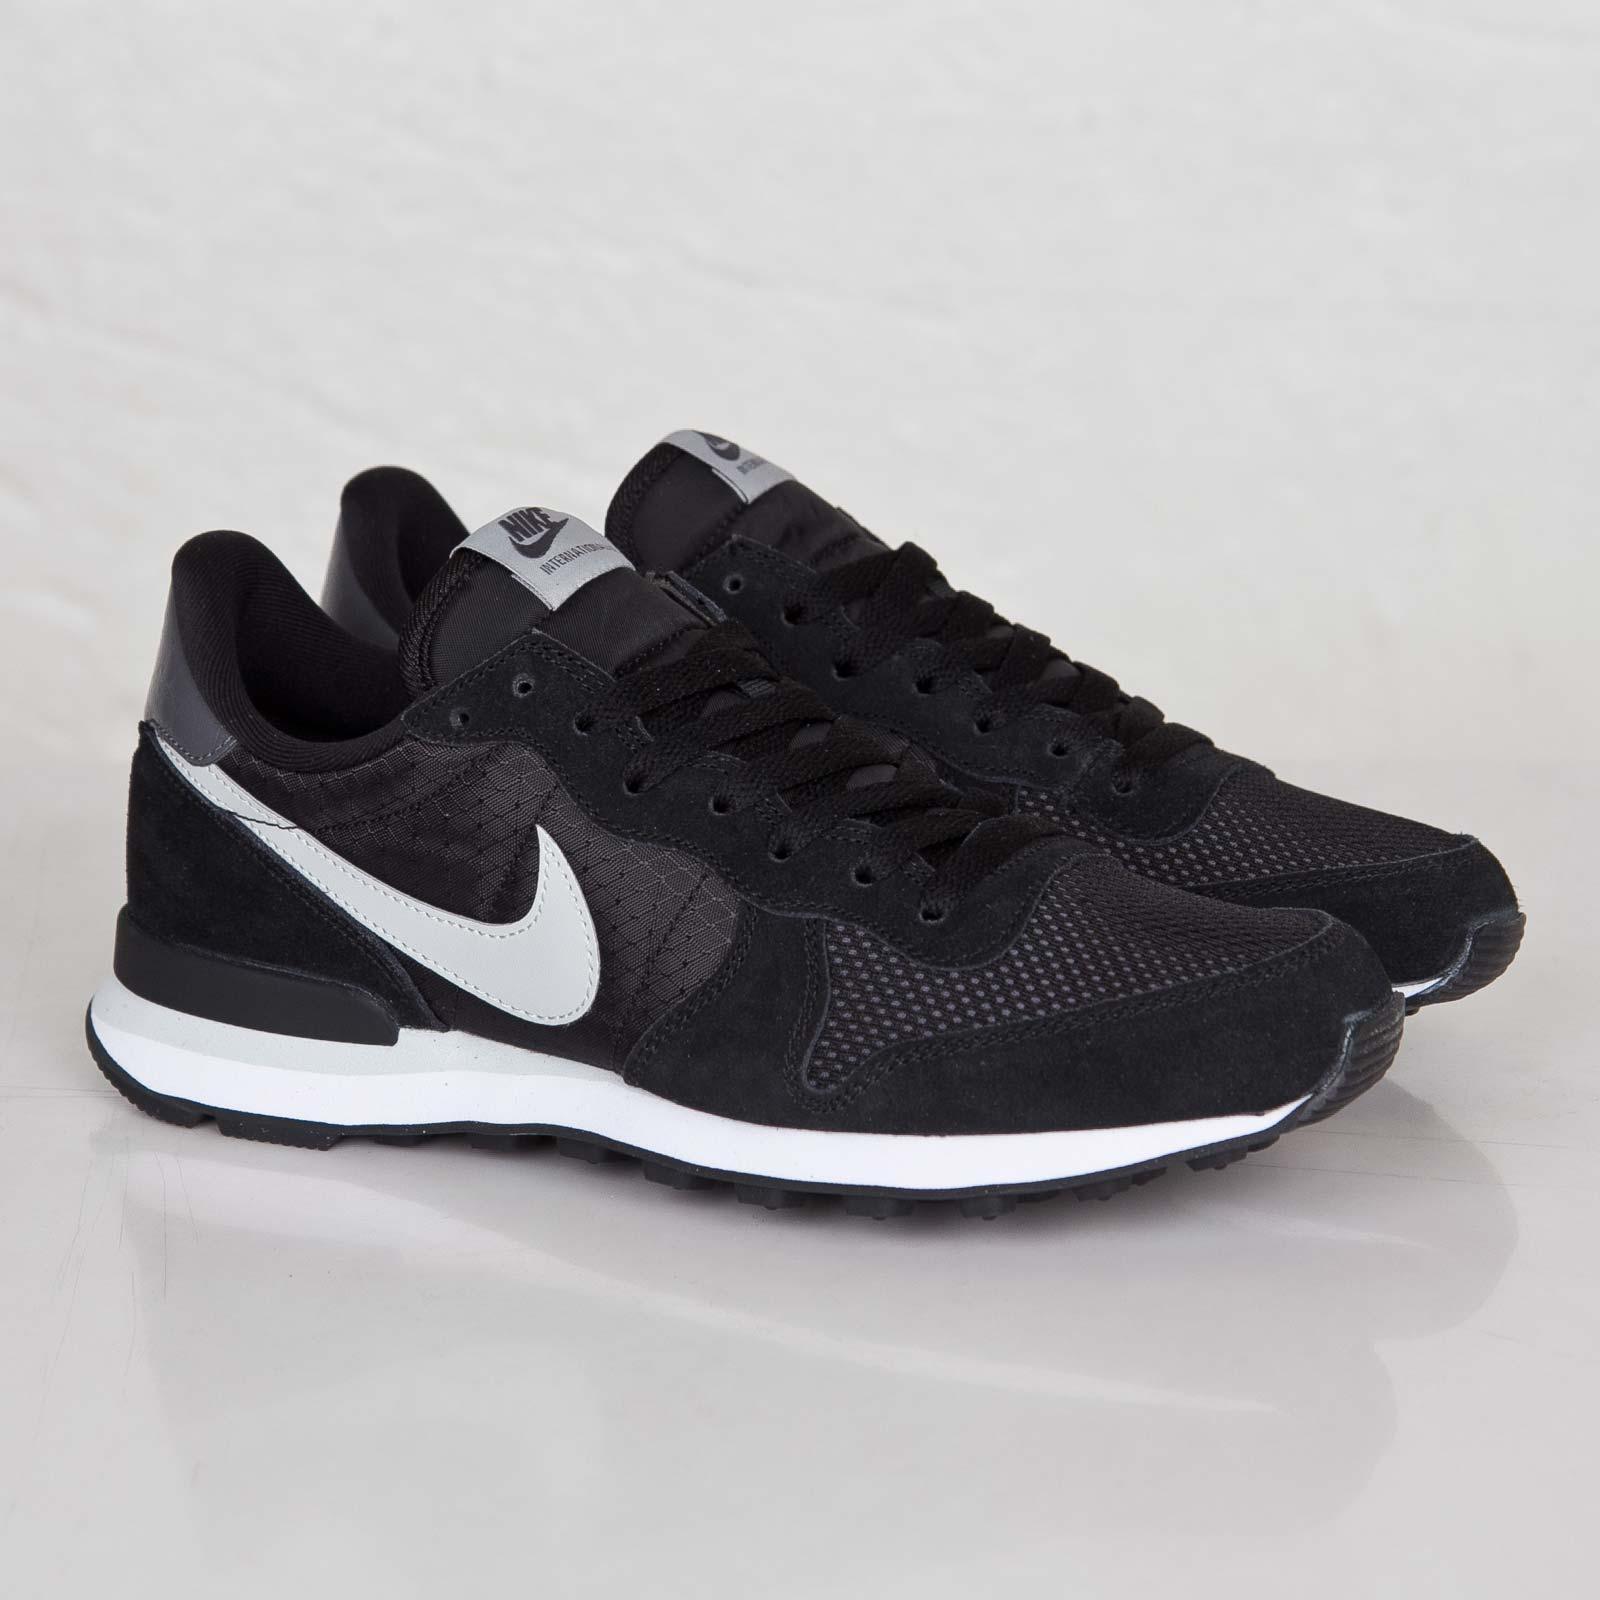 brand new e5a62 77c13 Nike Internationalist